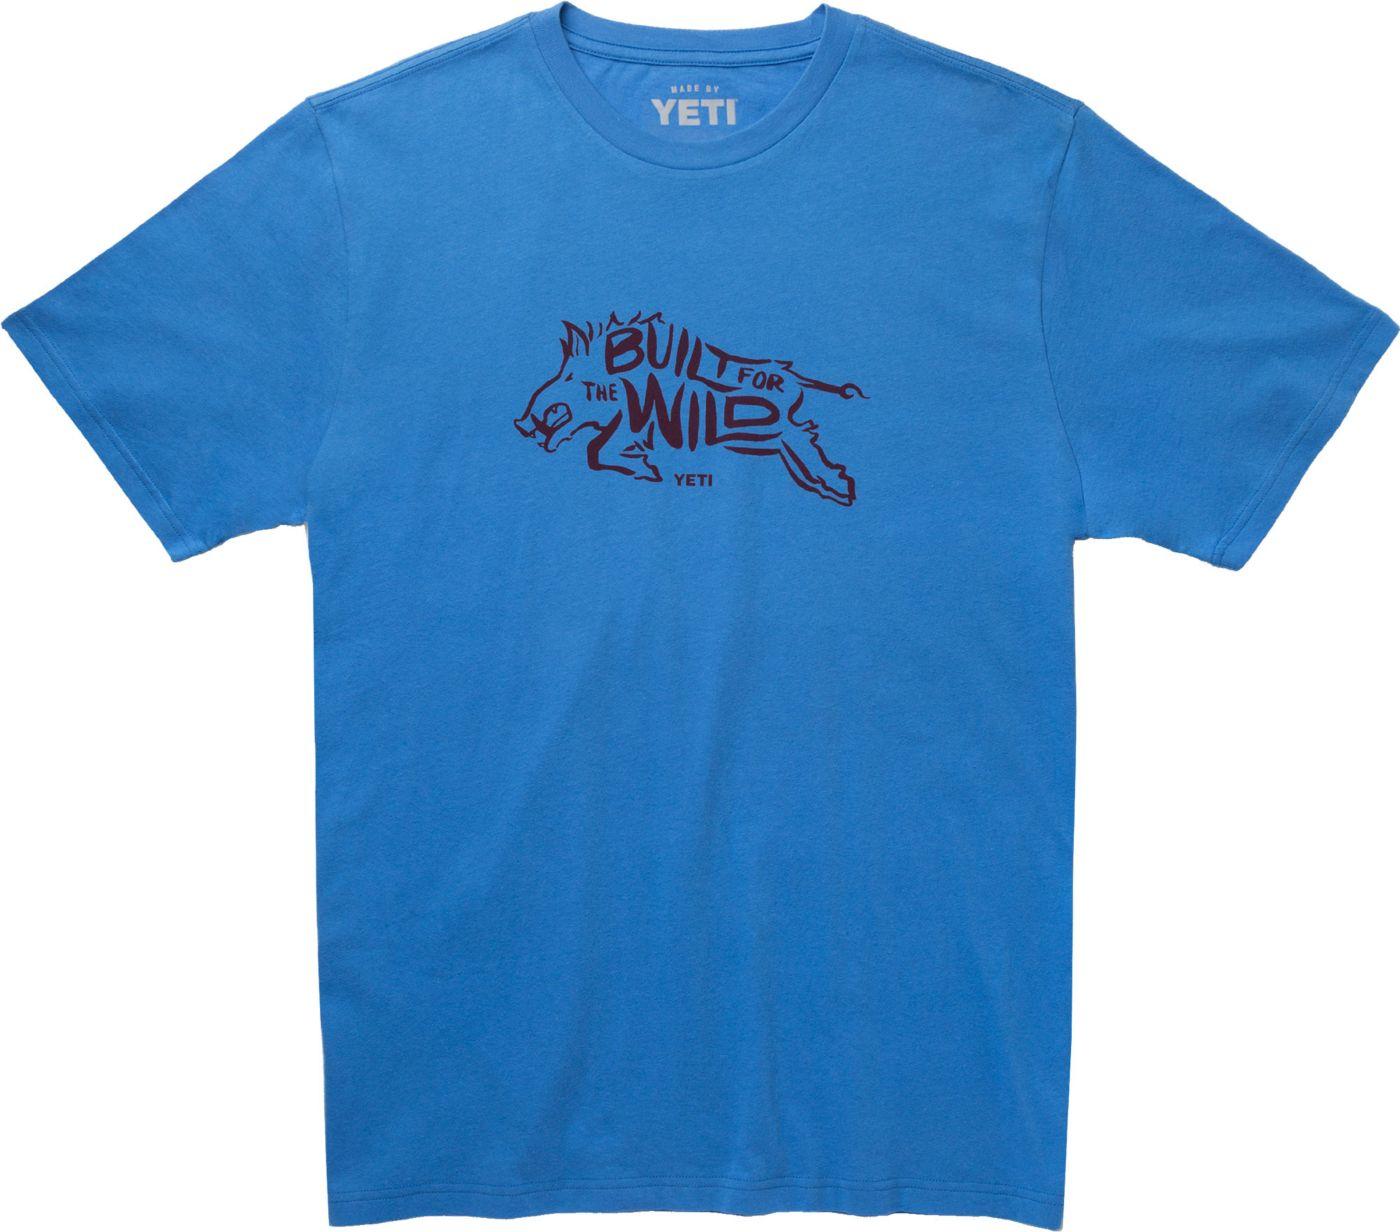 YETI Men's BFTW Boar Short Sleeve T-Shirt